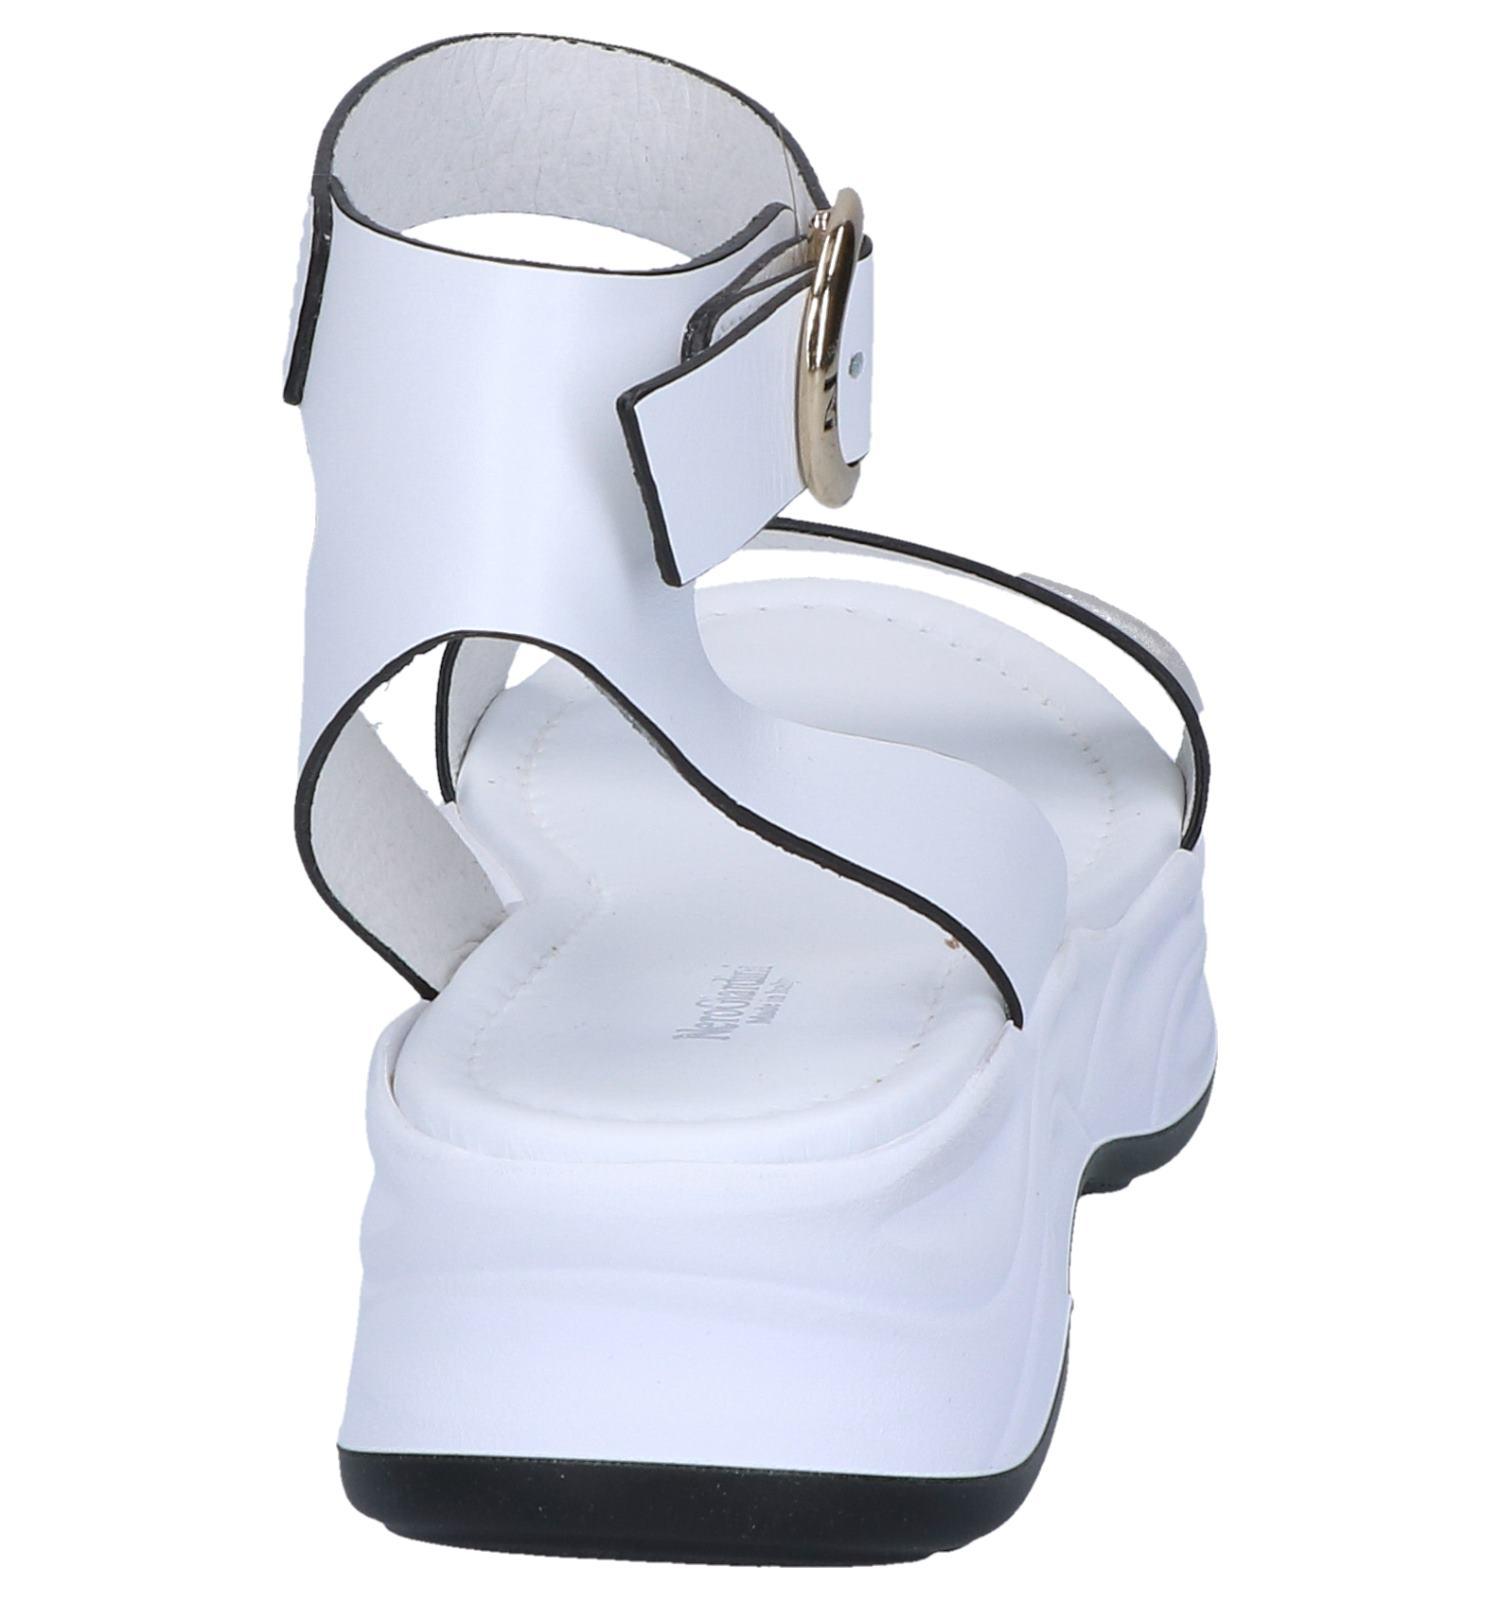 Witte Sandalen Witte Sandalen Nerogiardini Nerogiardini Sandalen Sandalen Witte Nerogiardini Nerogiardini Sandalen Nerogiardini Witte Witte sthQdr